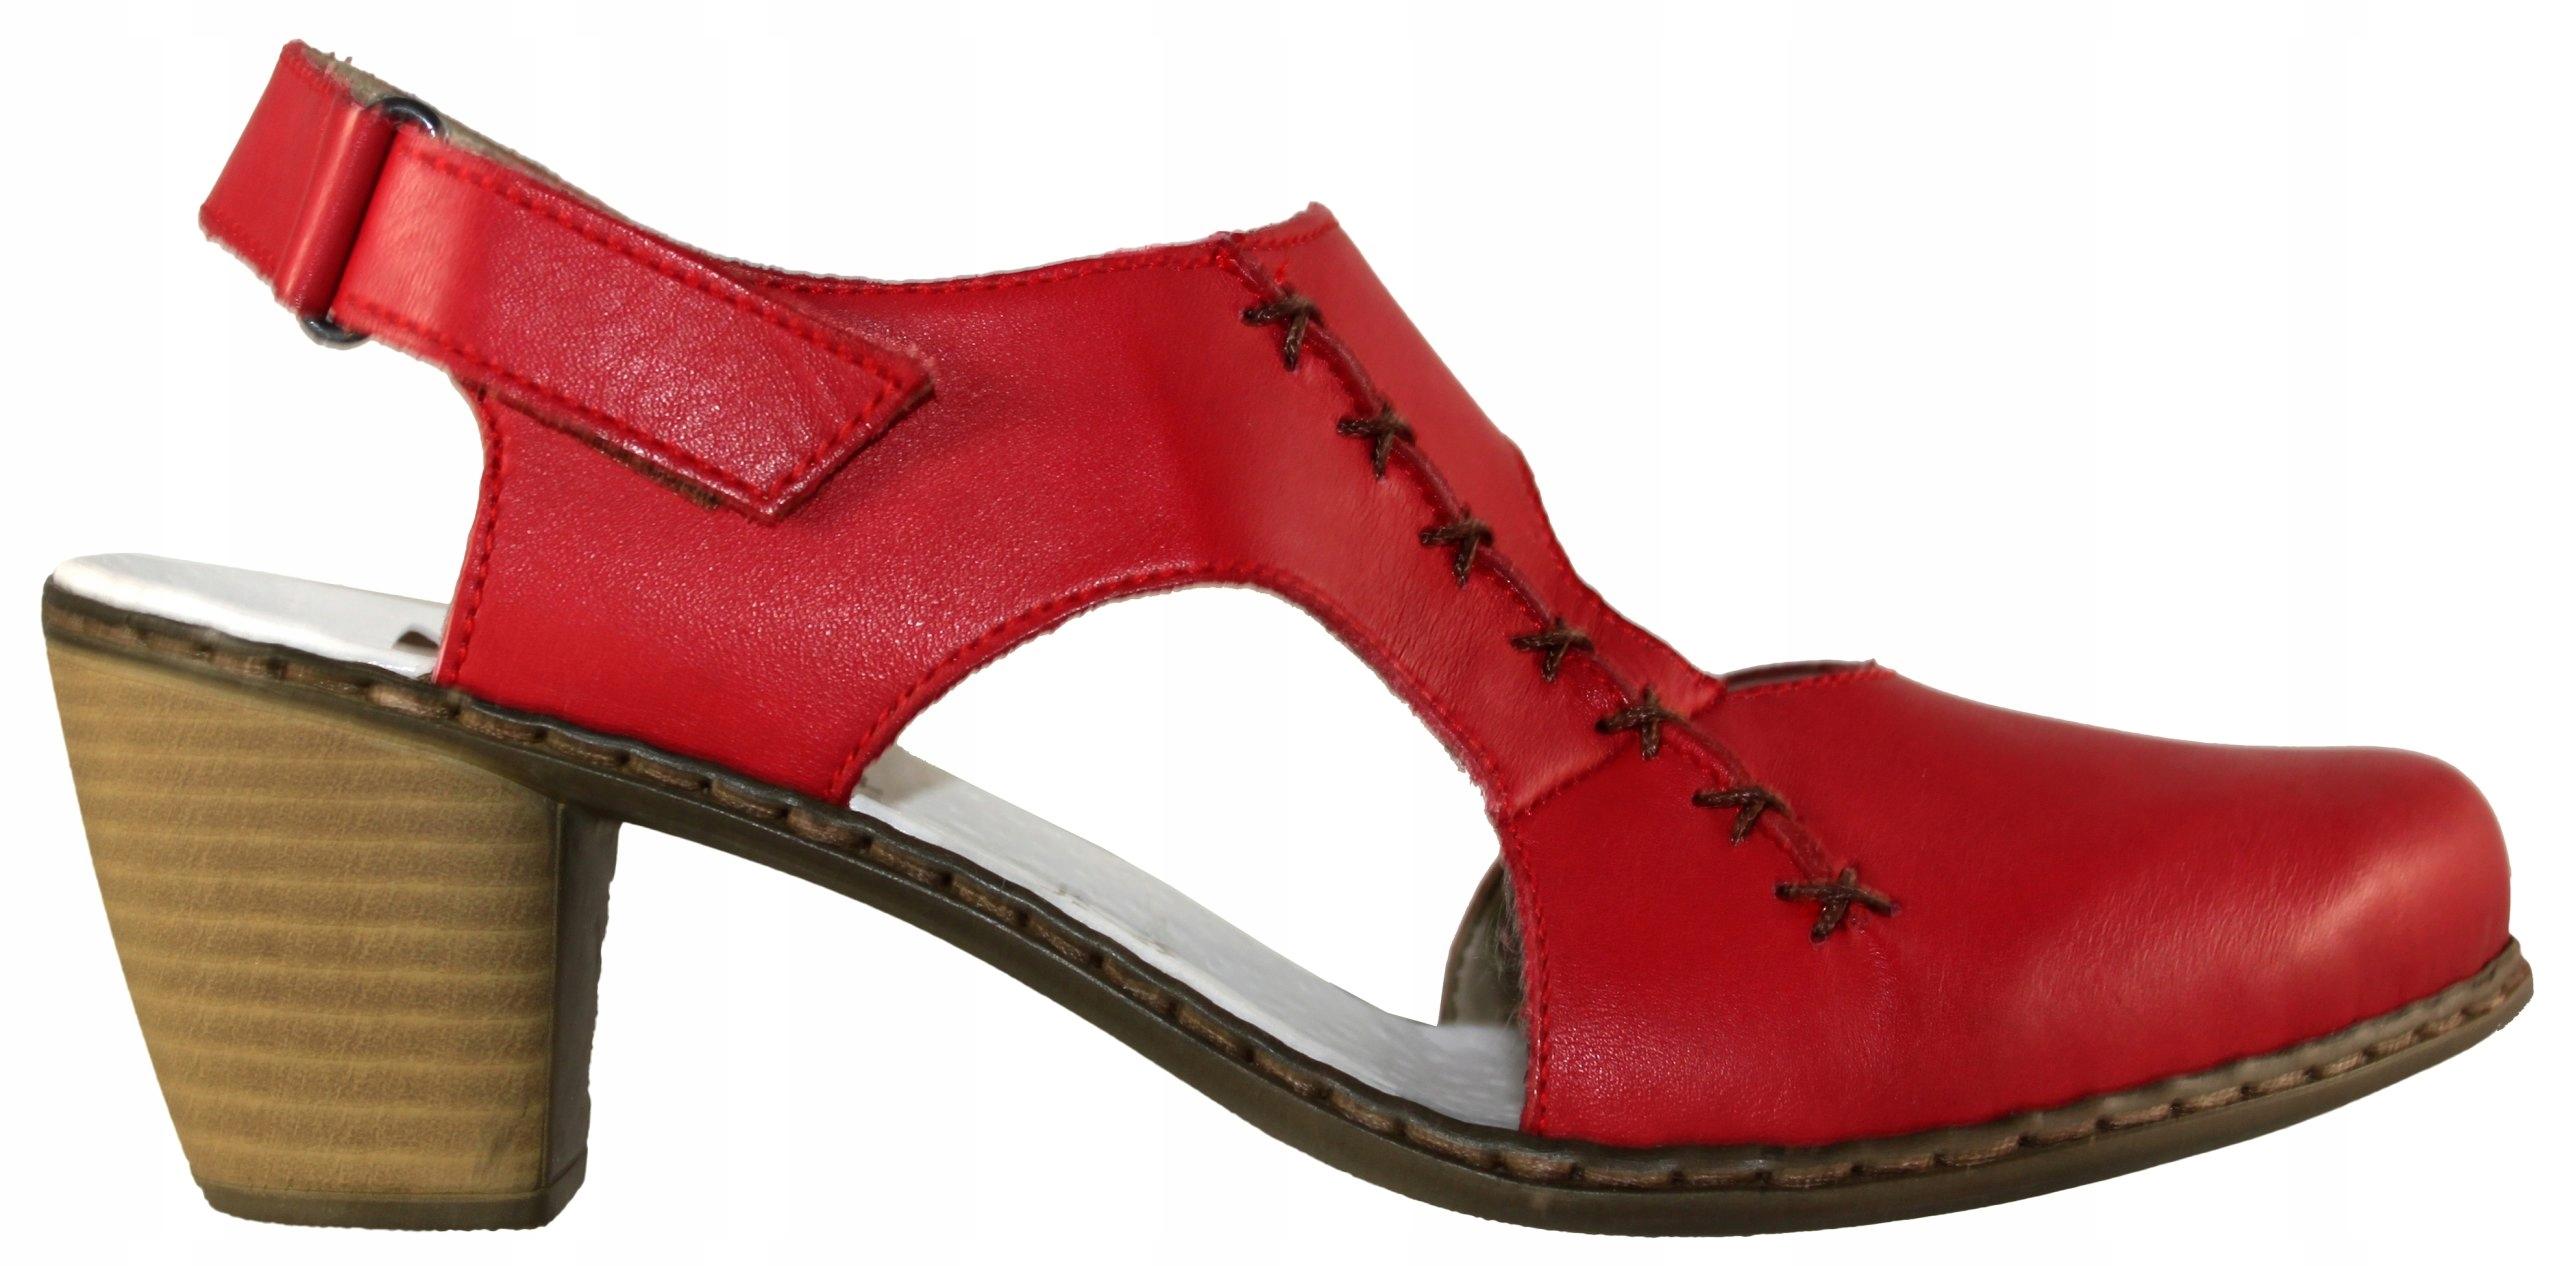 9d8474a5 RIEKER 40950-33 sandały czerwone 36 PIEKNEBUTY - 7315293588 ...